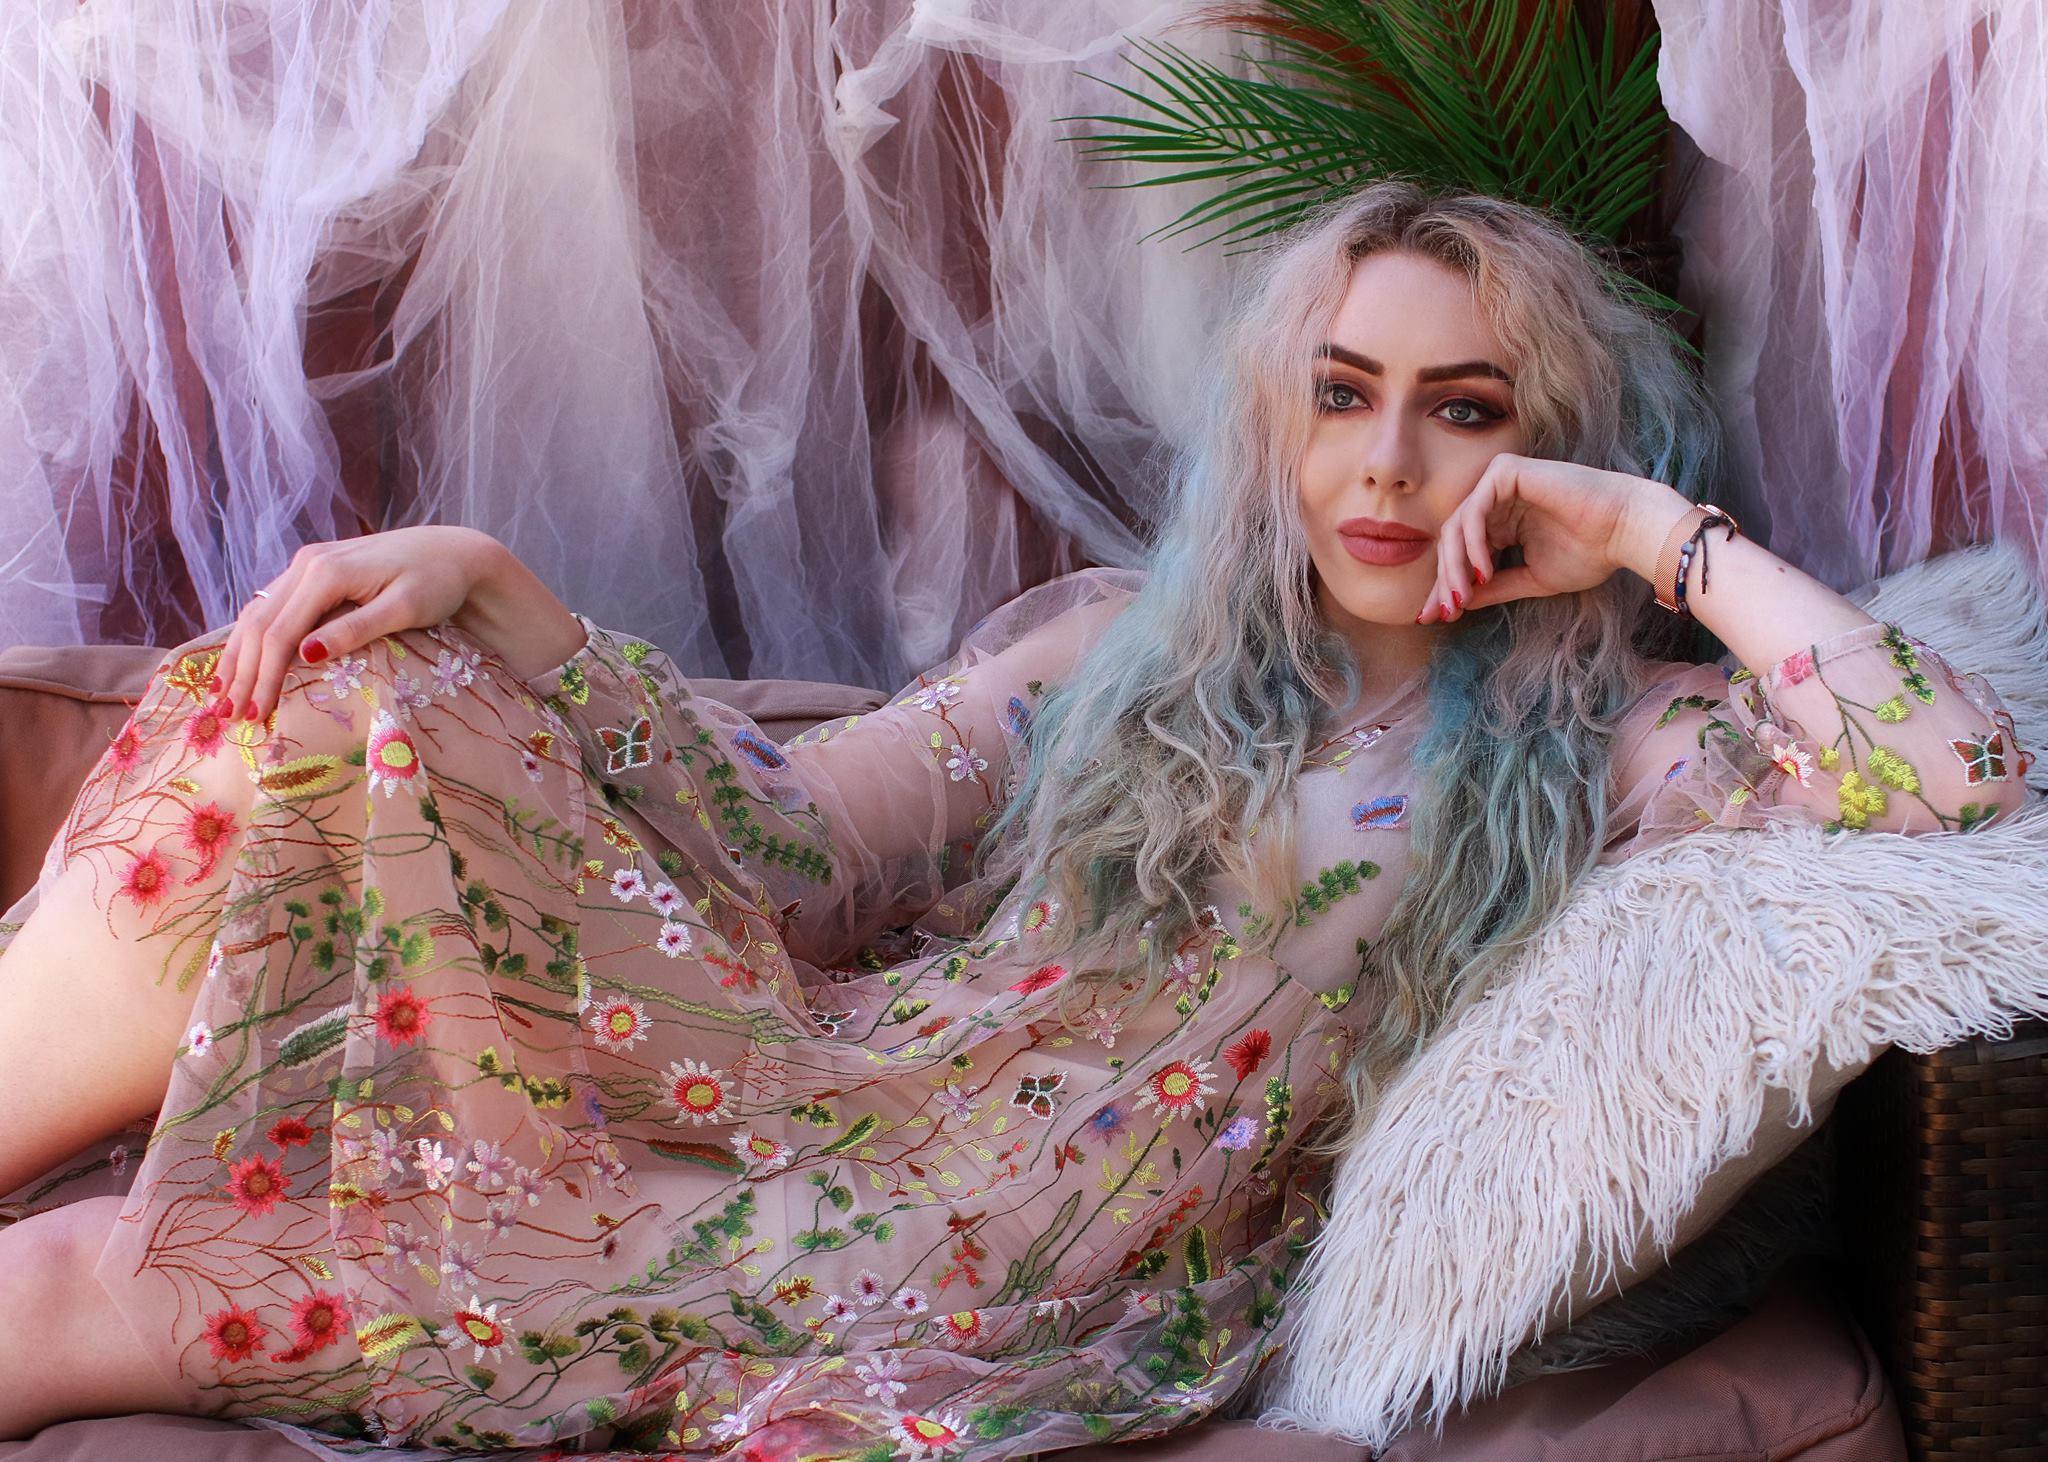 stephi lareine uk fashion blogger wears h&m boho floral embroidered dress